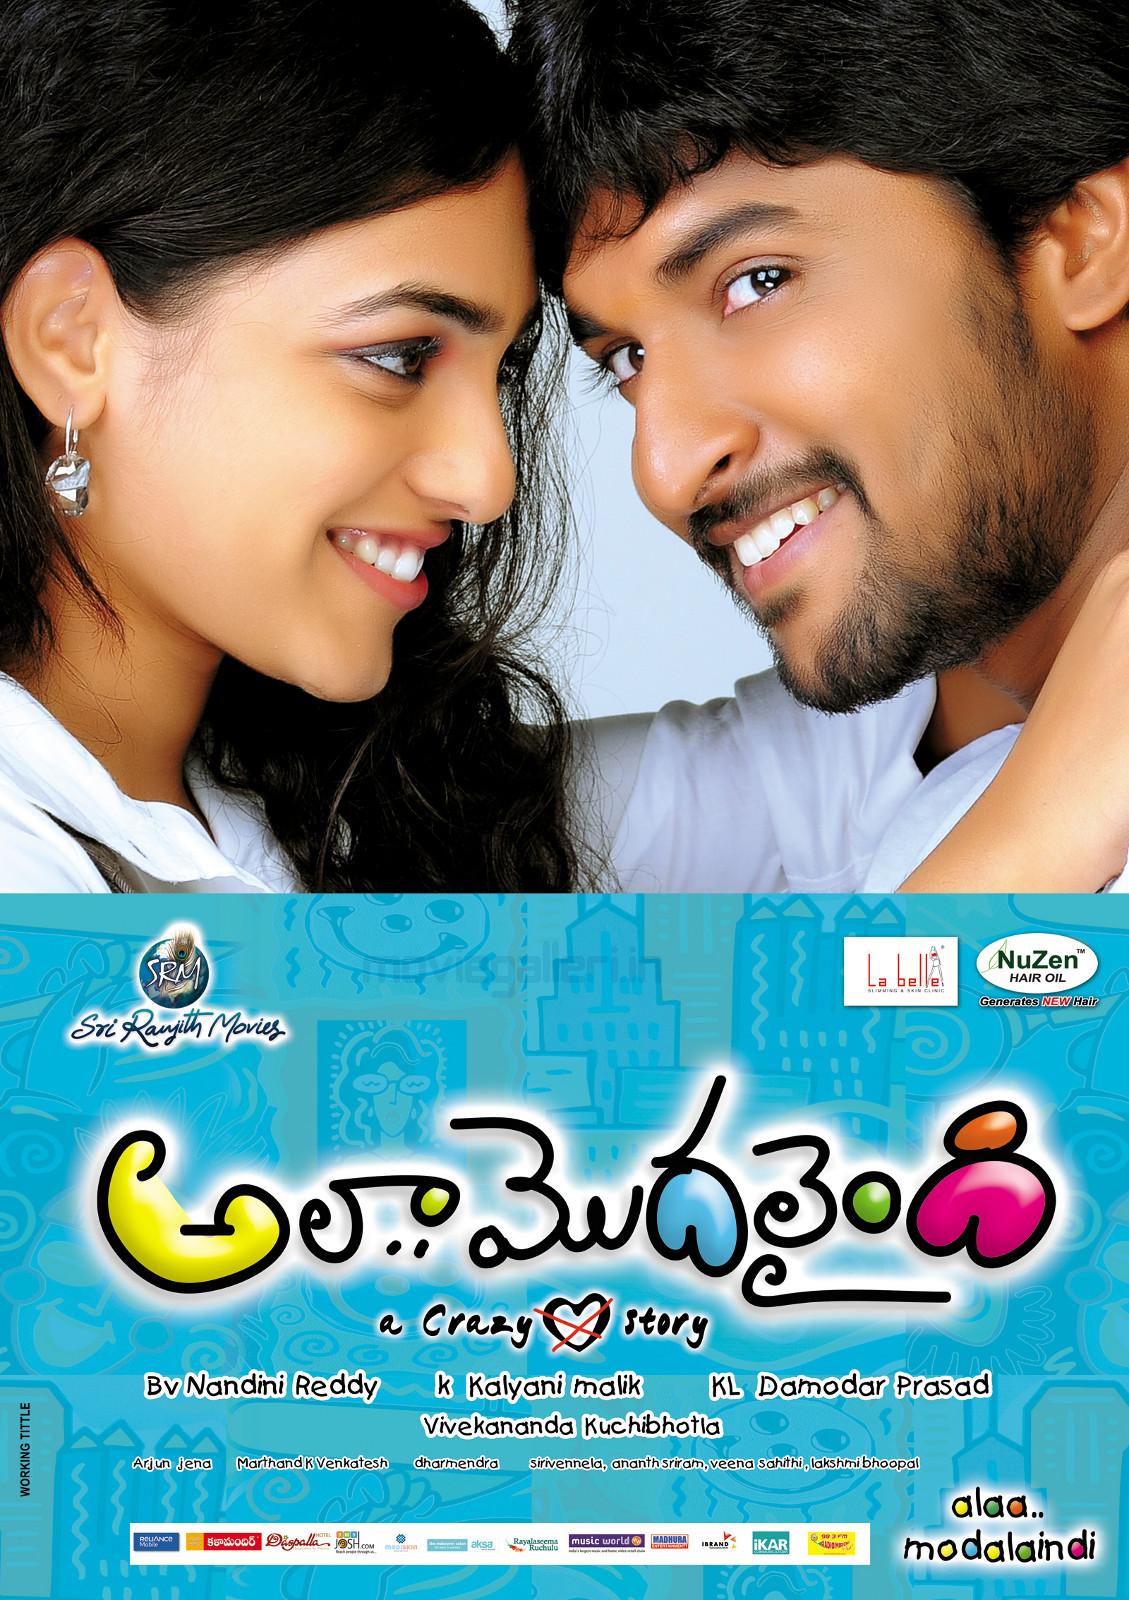 Ala Modalaindi Telugu Full Movie